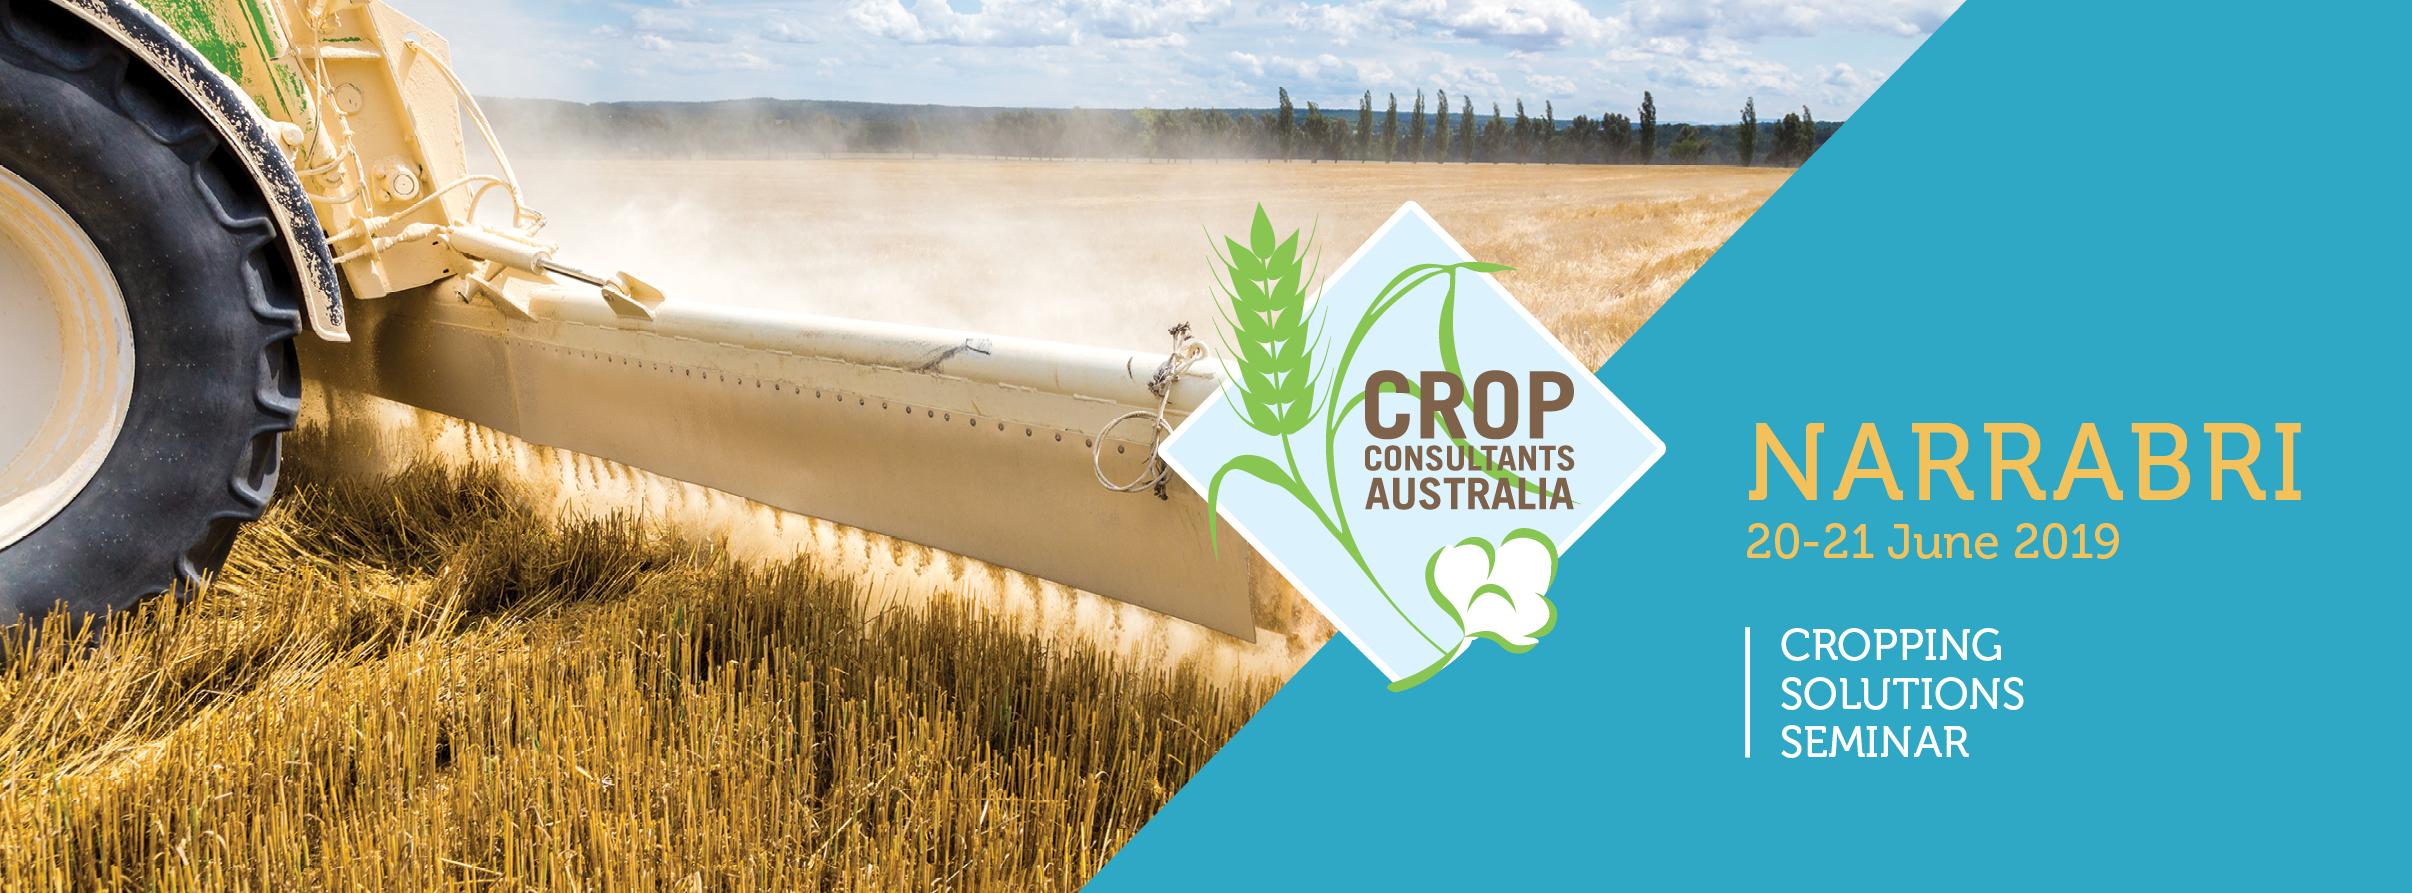 CCA Cropping Solutions Seminar